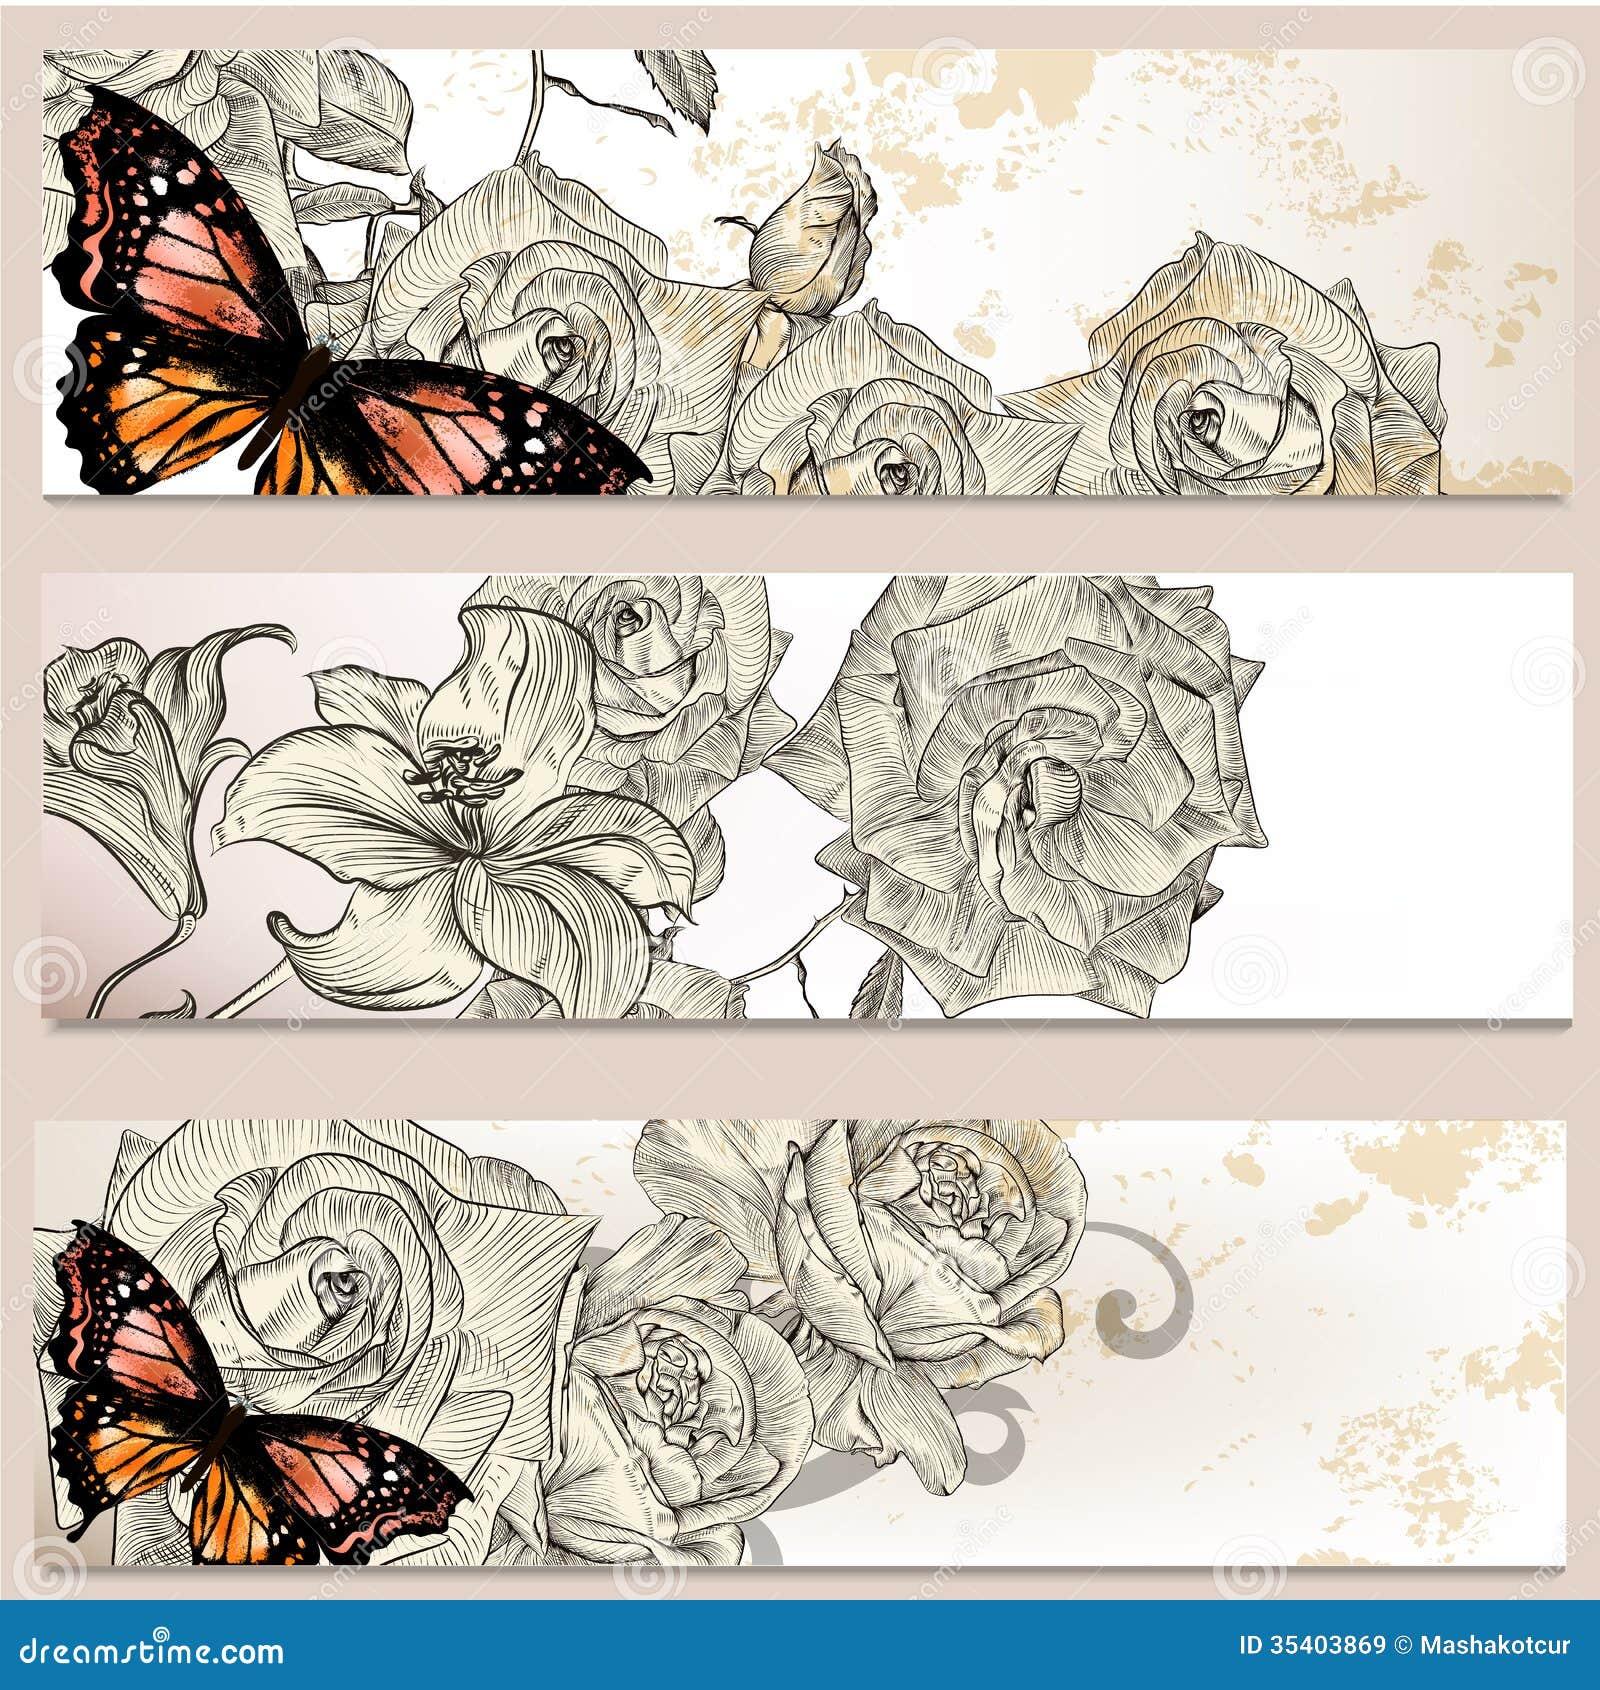 Floral Business Cards Set For Design Stock Vector - Illustration of ...